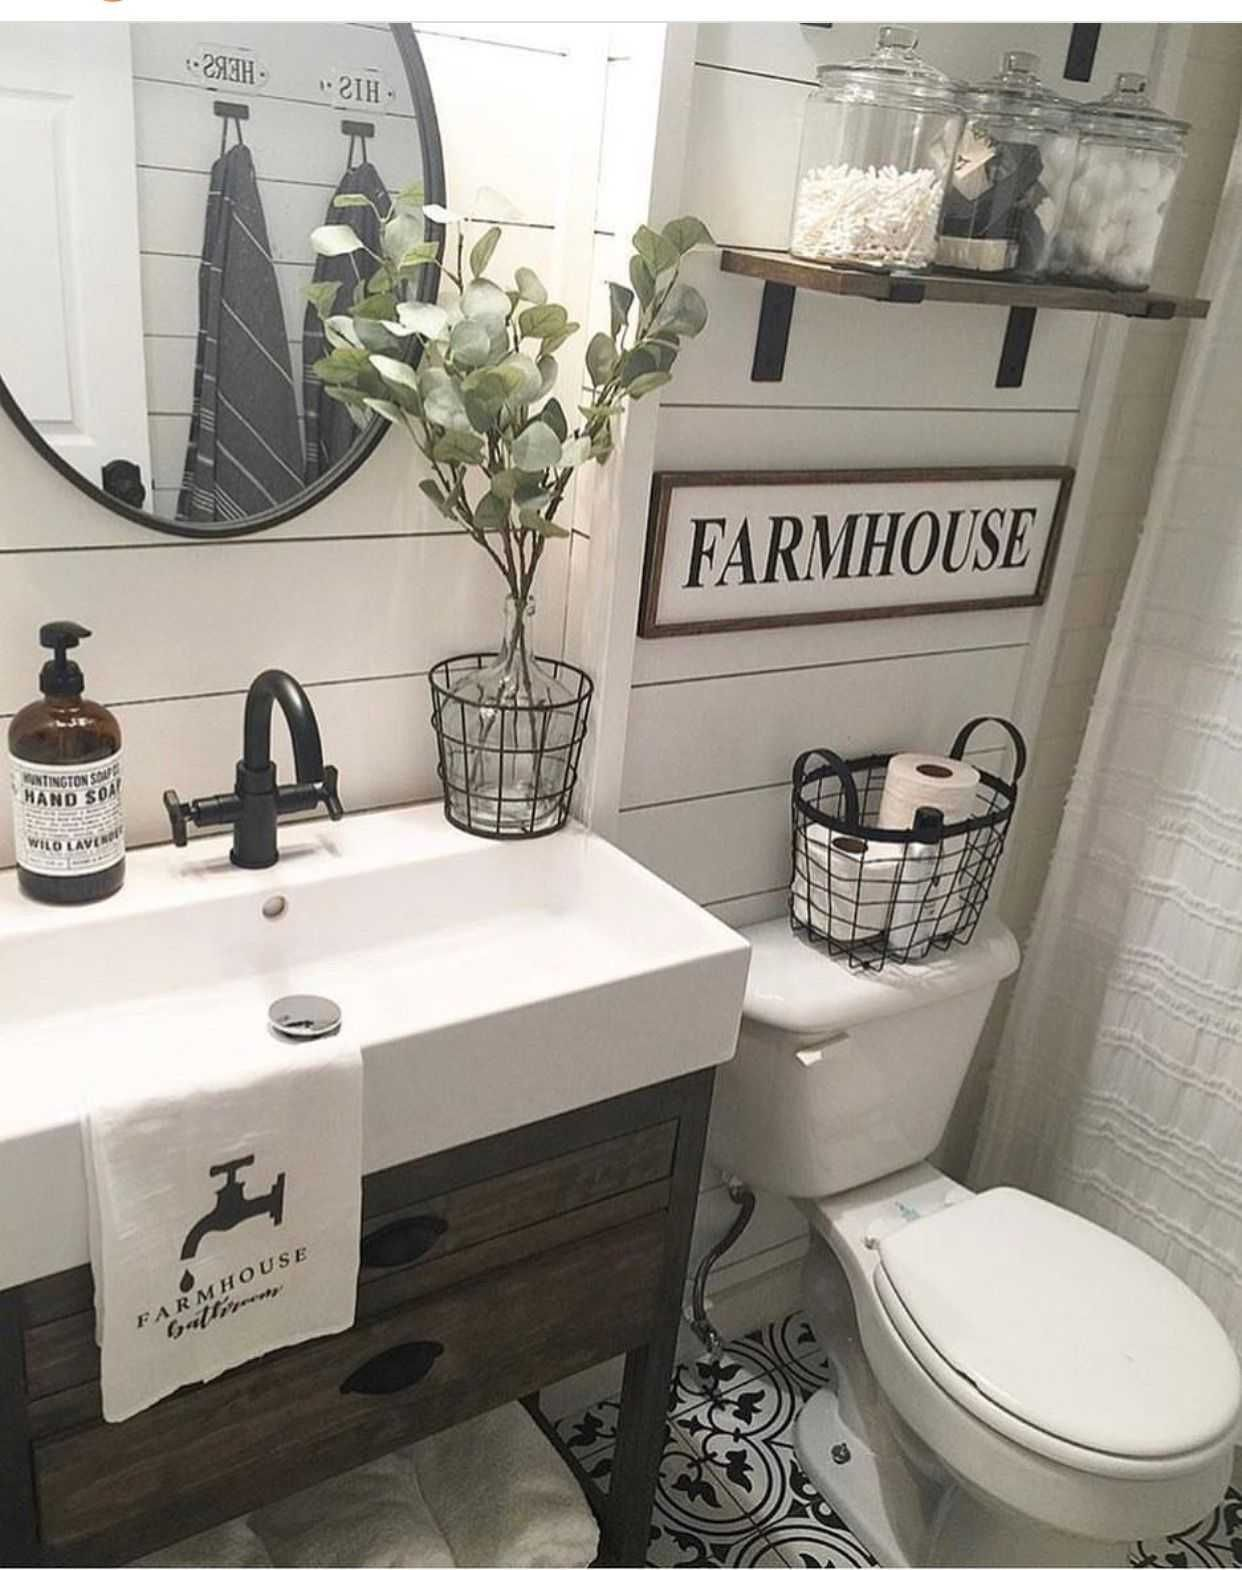 Farmhouse Powder Room Signs Unique Farmhouse Powder Room Signs Folk Art Chalk Paint Colo Modern Farmhouse Bathroom Bathroom Decor Farmhouse Bathroom Vanity Folk art bathroom decor